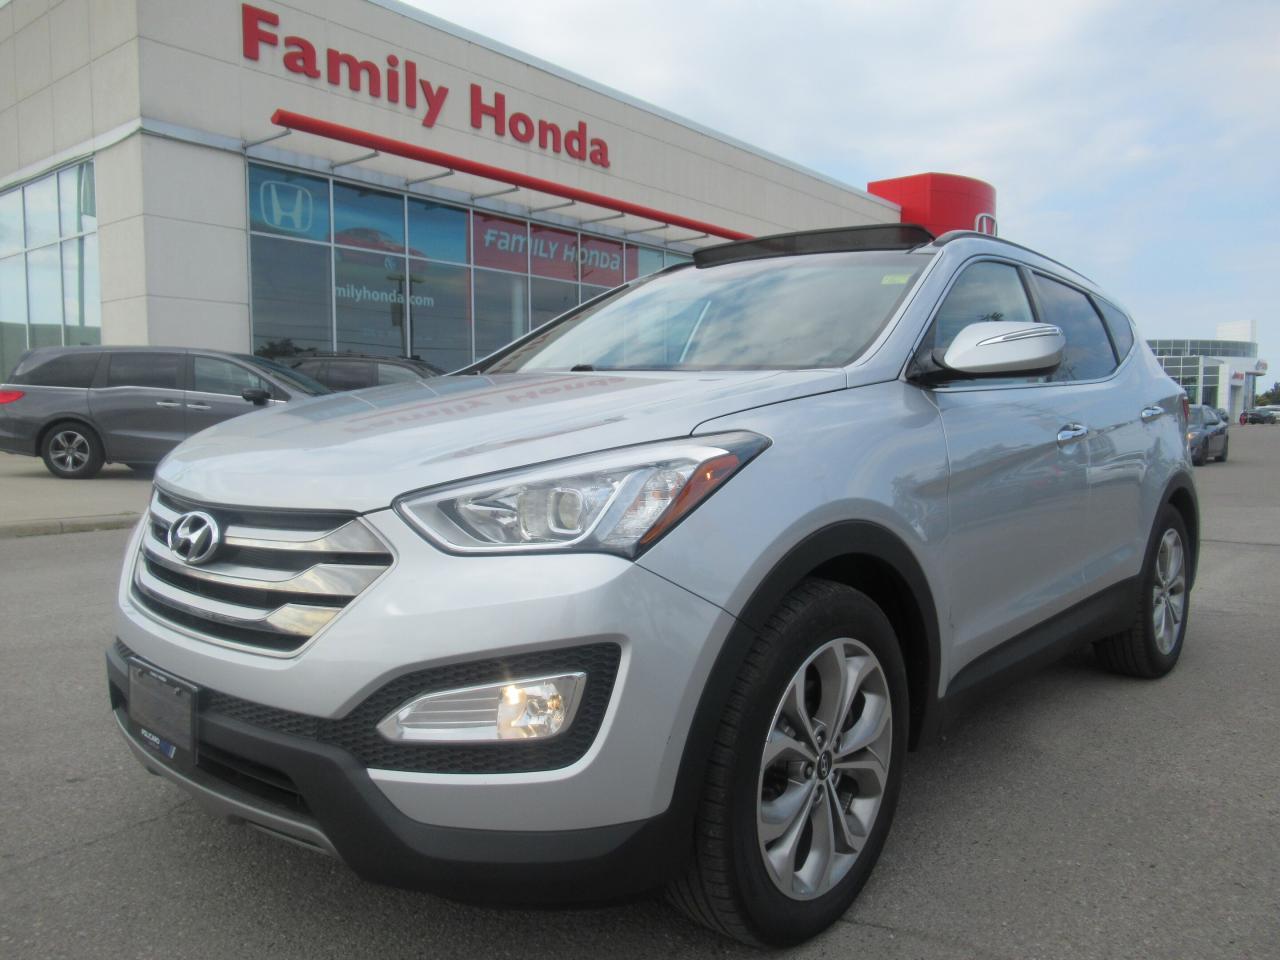 Used 2015 Hyundai Santa Fe Sport Awd Limited Fully Loaded